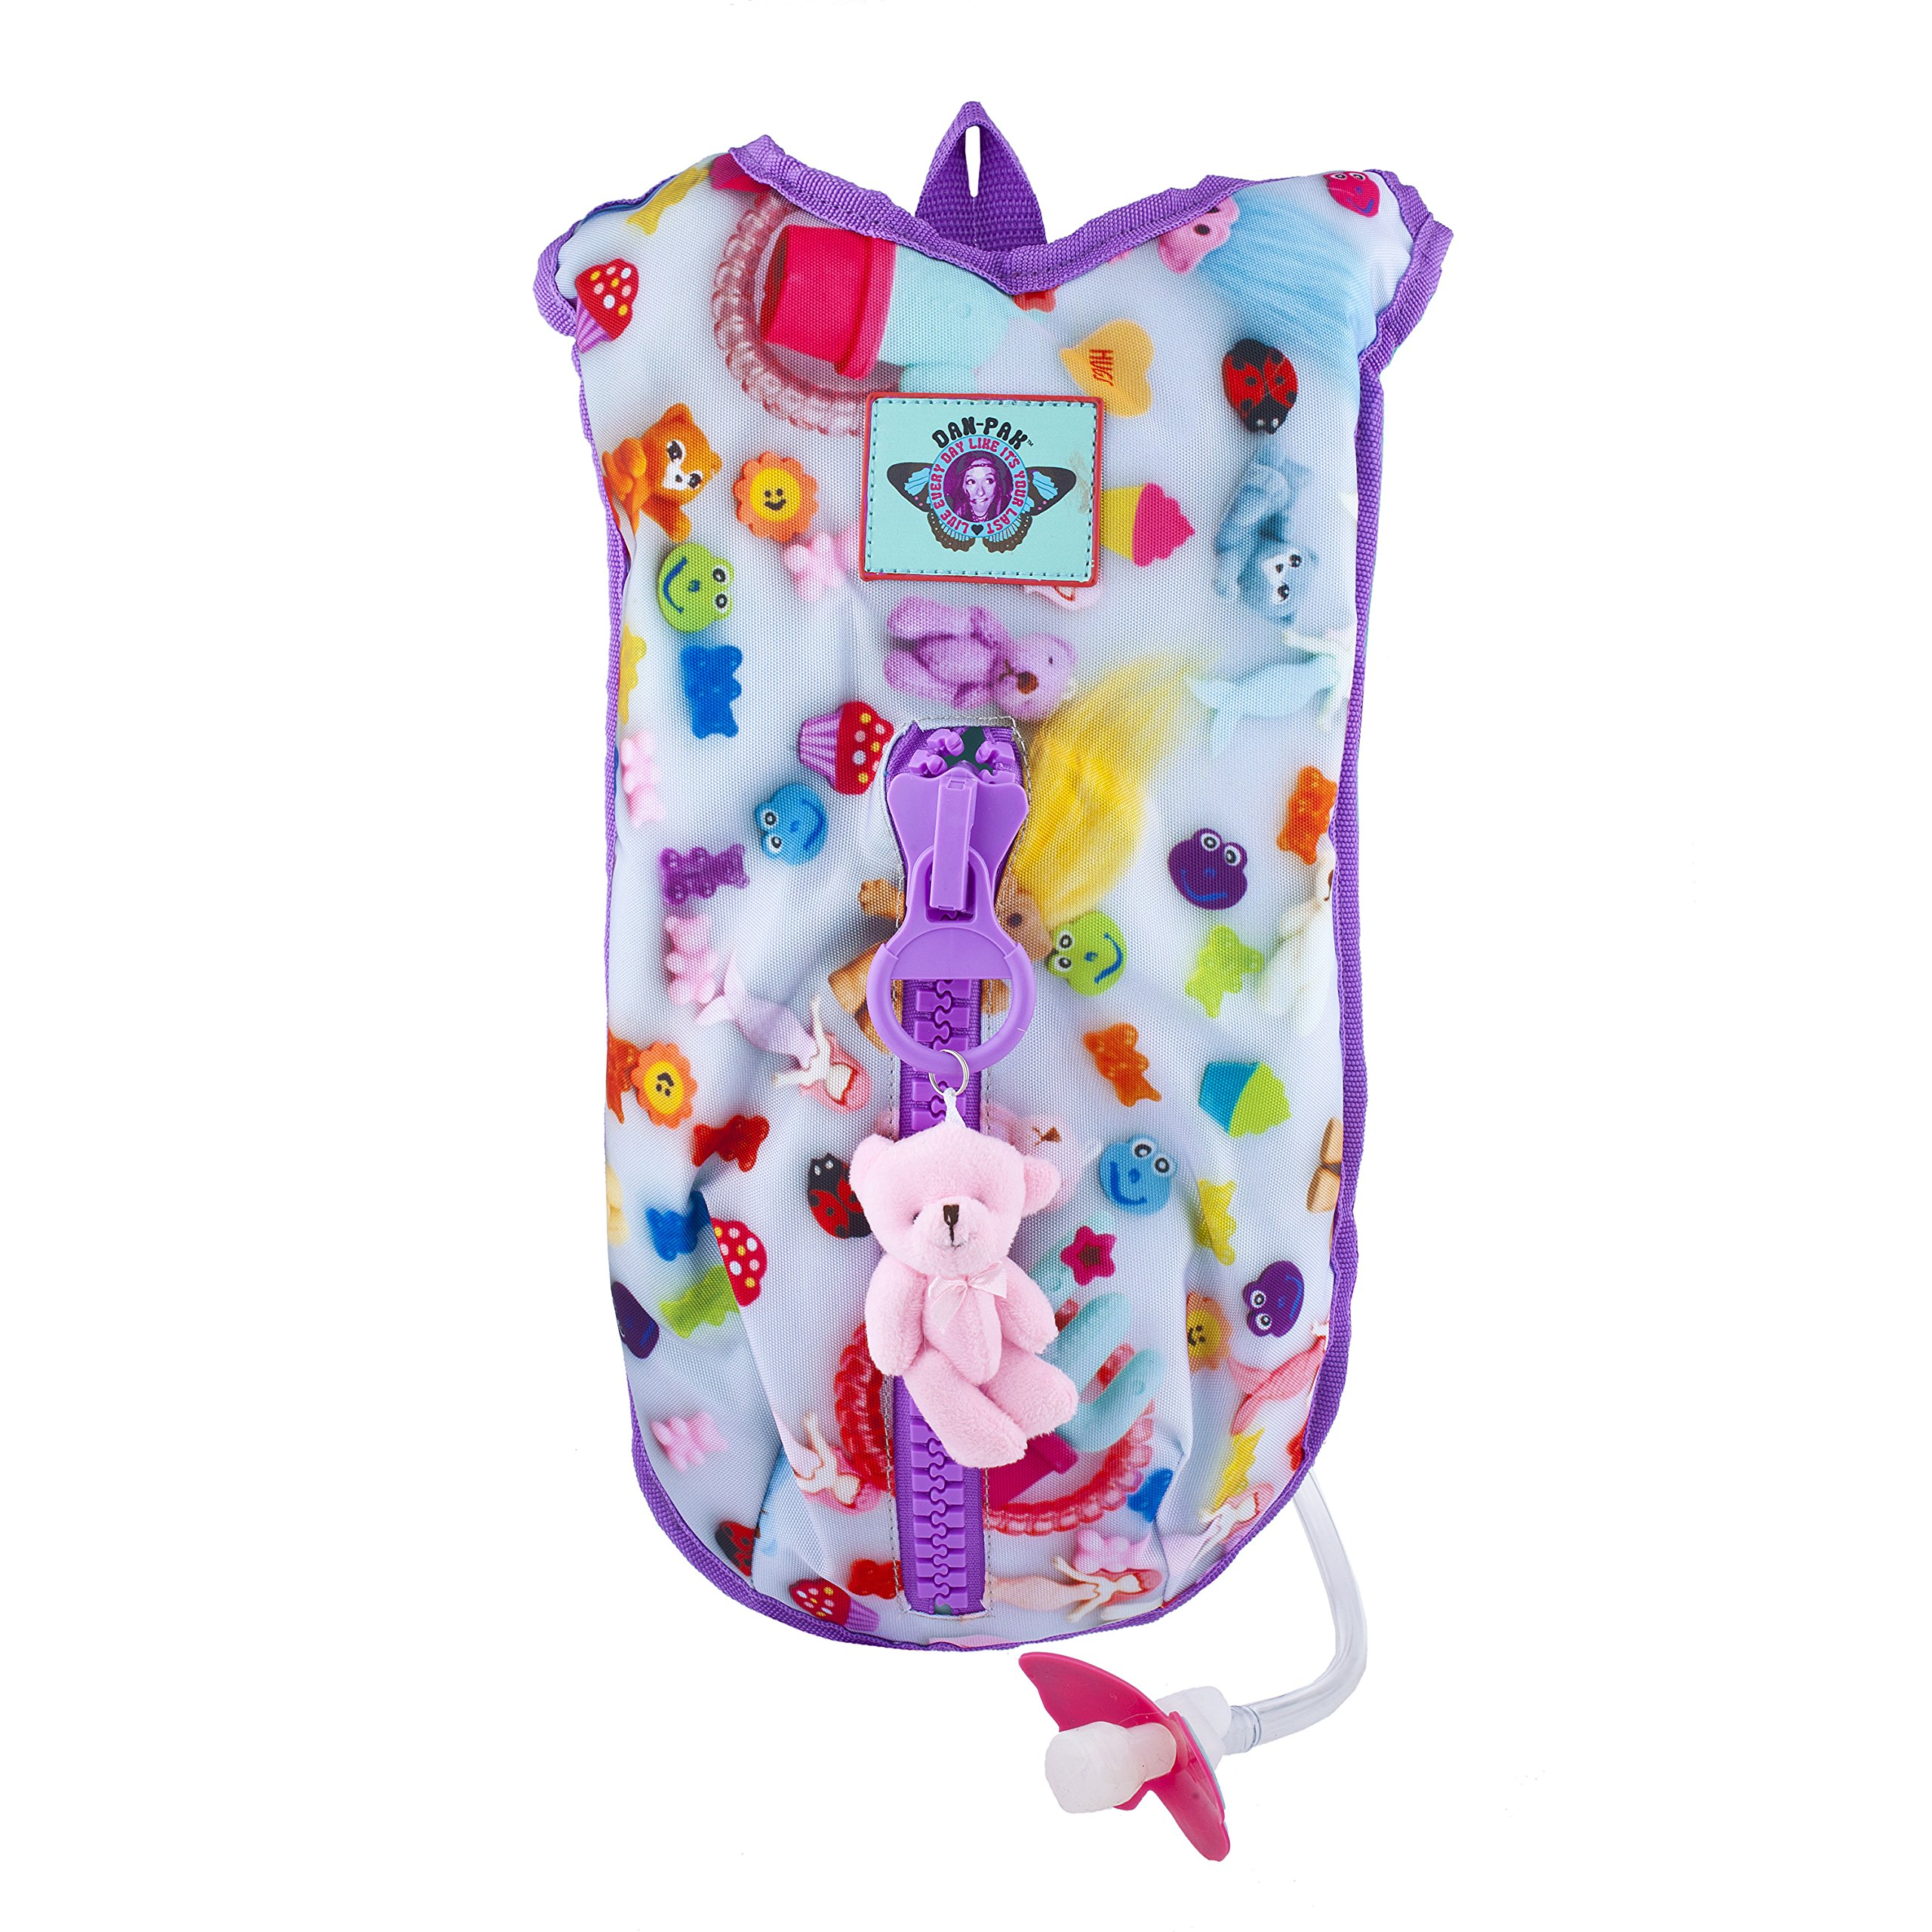 Dan Pak Hydration Pack 2l-Toys - Pink hanging bear and chunky purple zipper!